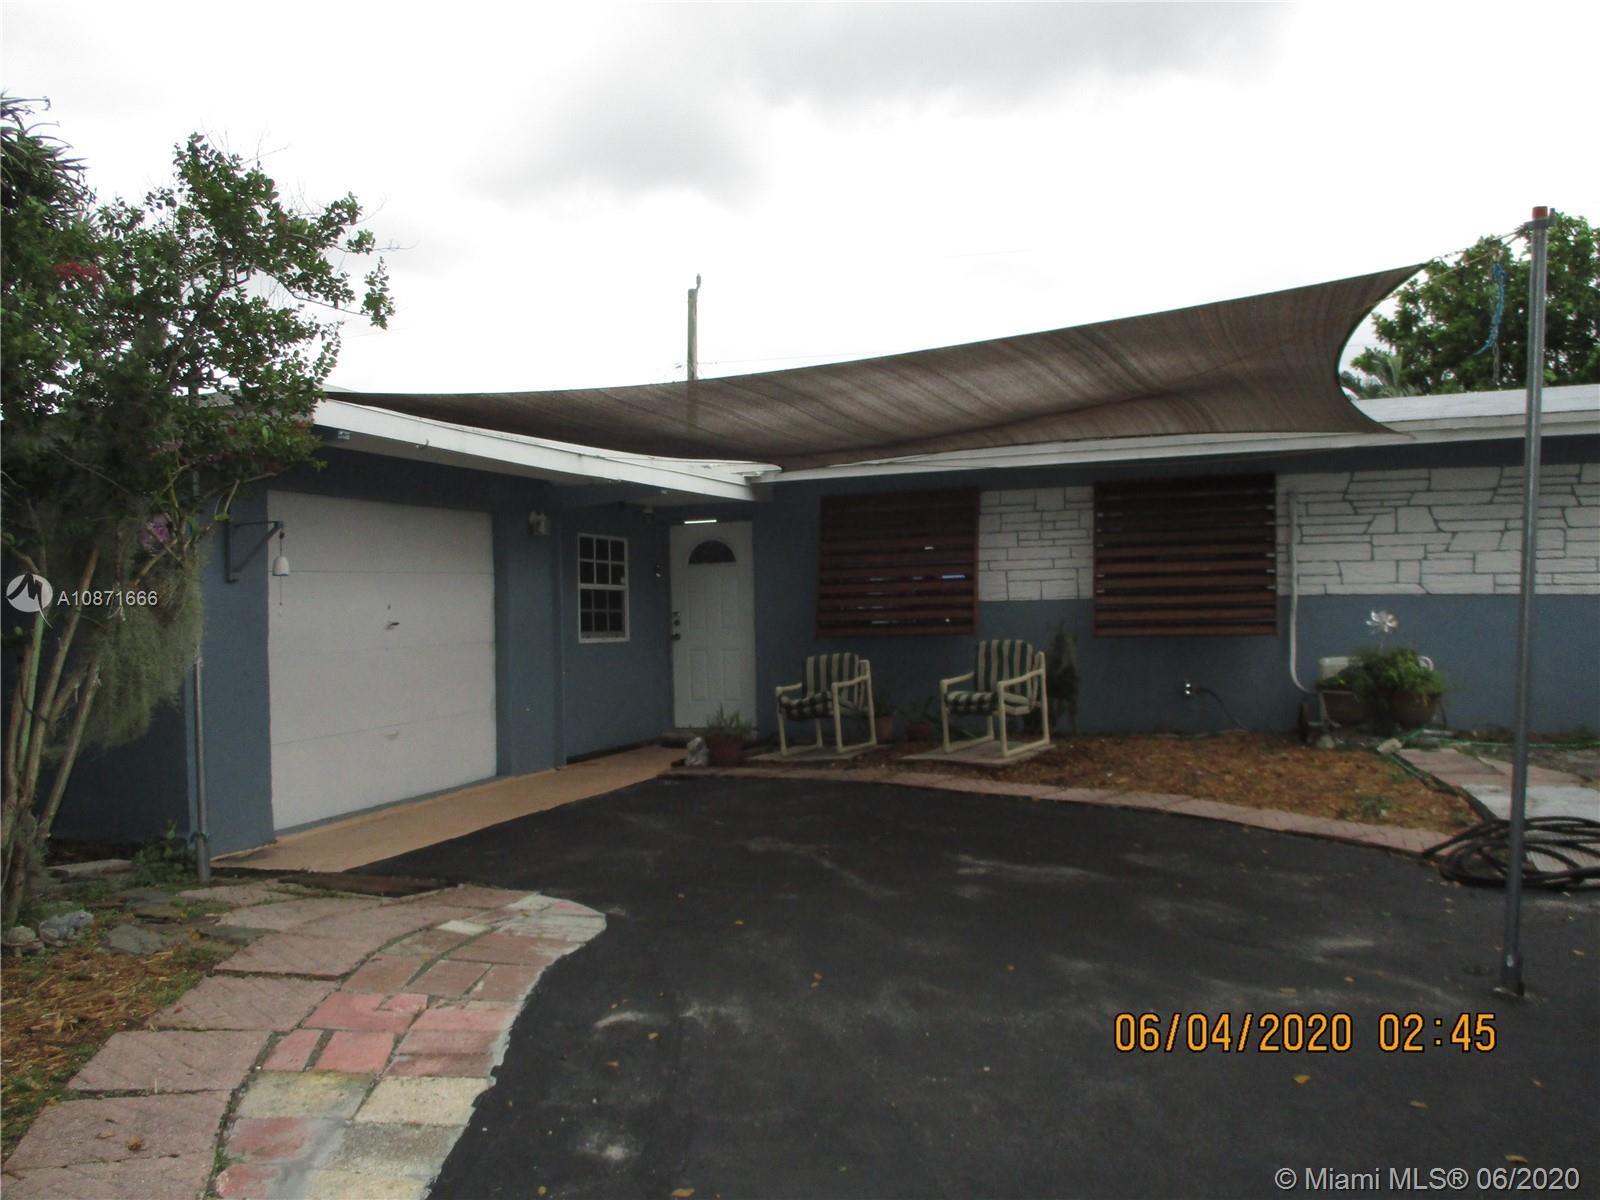 7851 Hope St, Hollywood, FL 33024 - #: A10871666